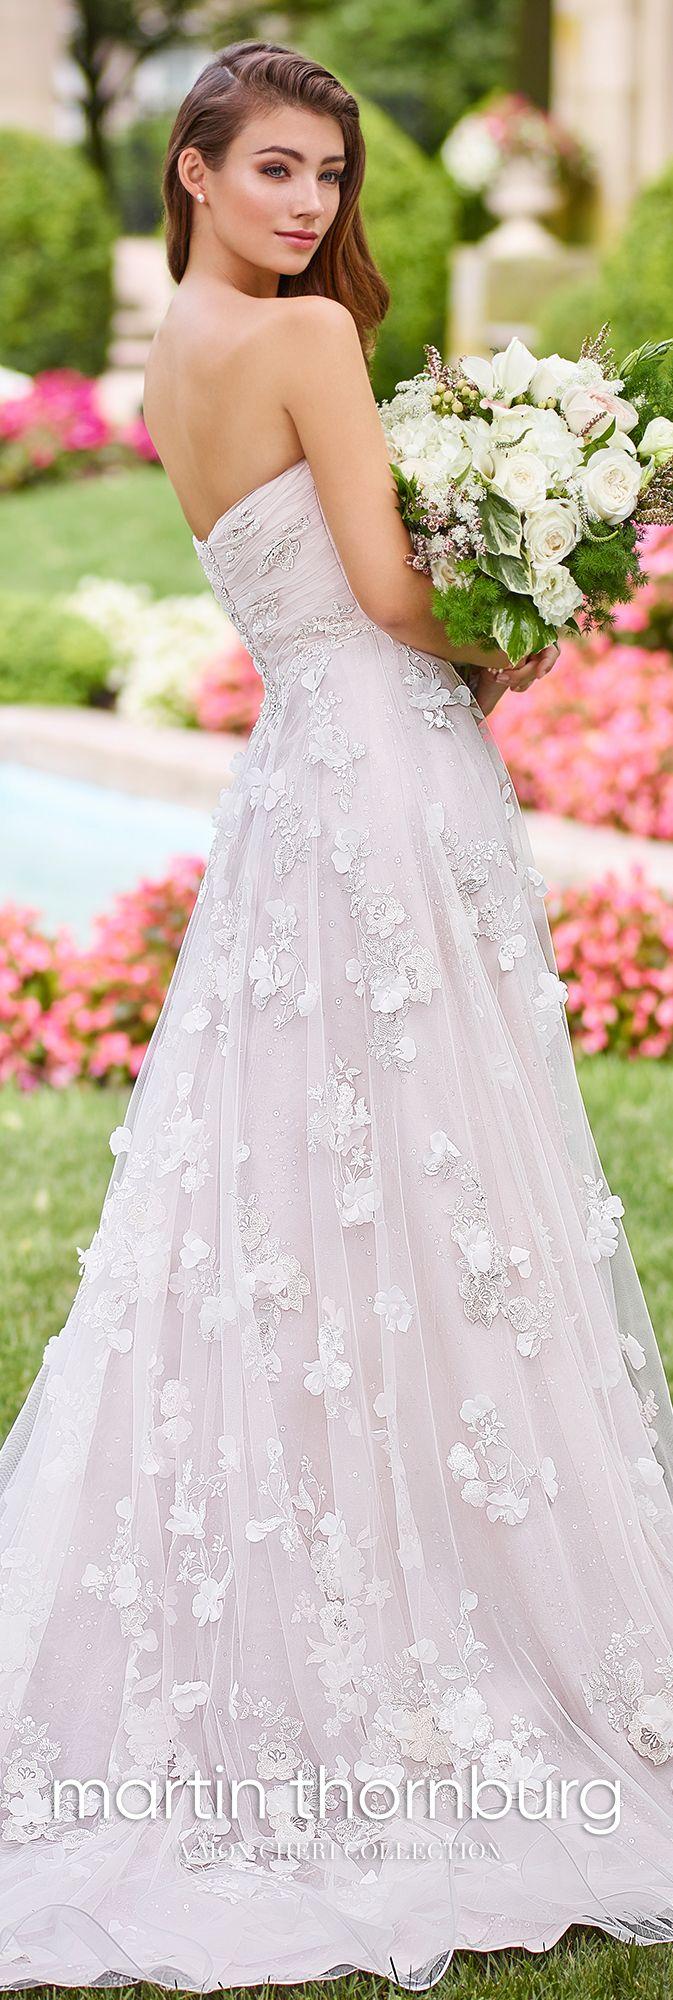 1c08e44889 Martin Thornburg 118258 Harmony - Ultra-feminine Harmony is a strapless  sequin lace appliqué